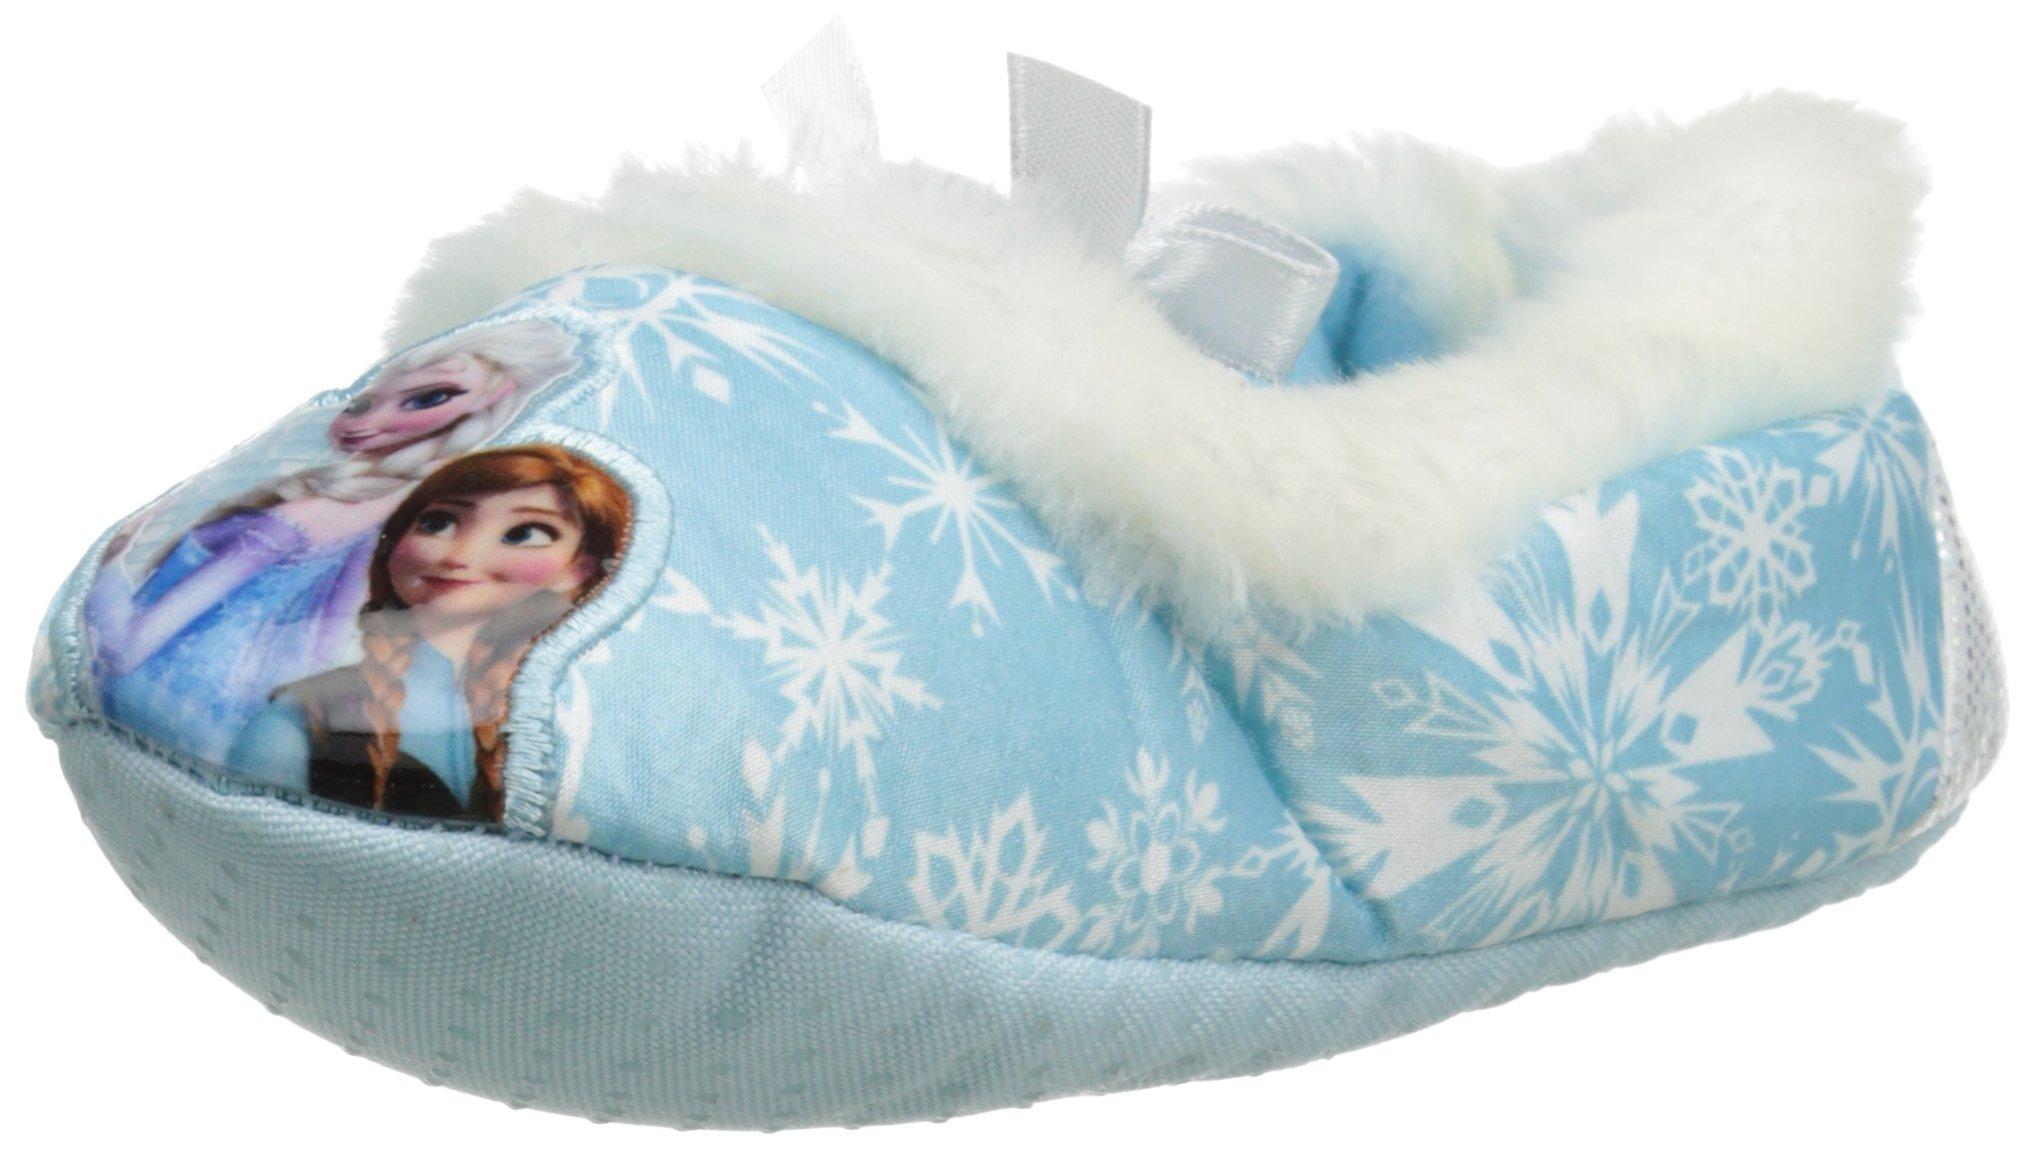 Disney Frozen Elsa and Anna Slipper (Toddler)